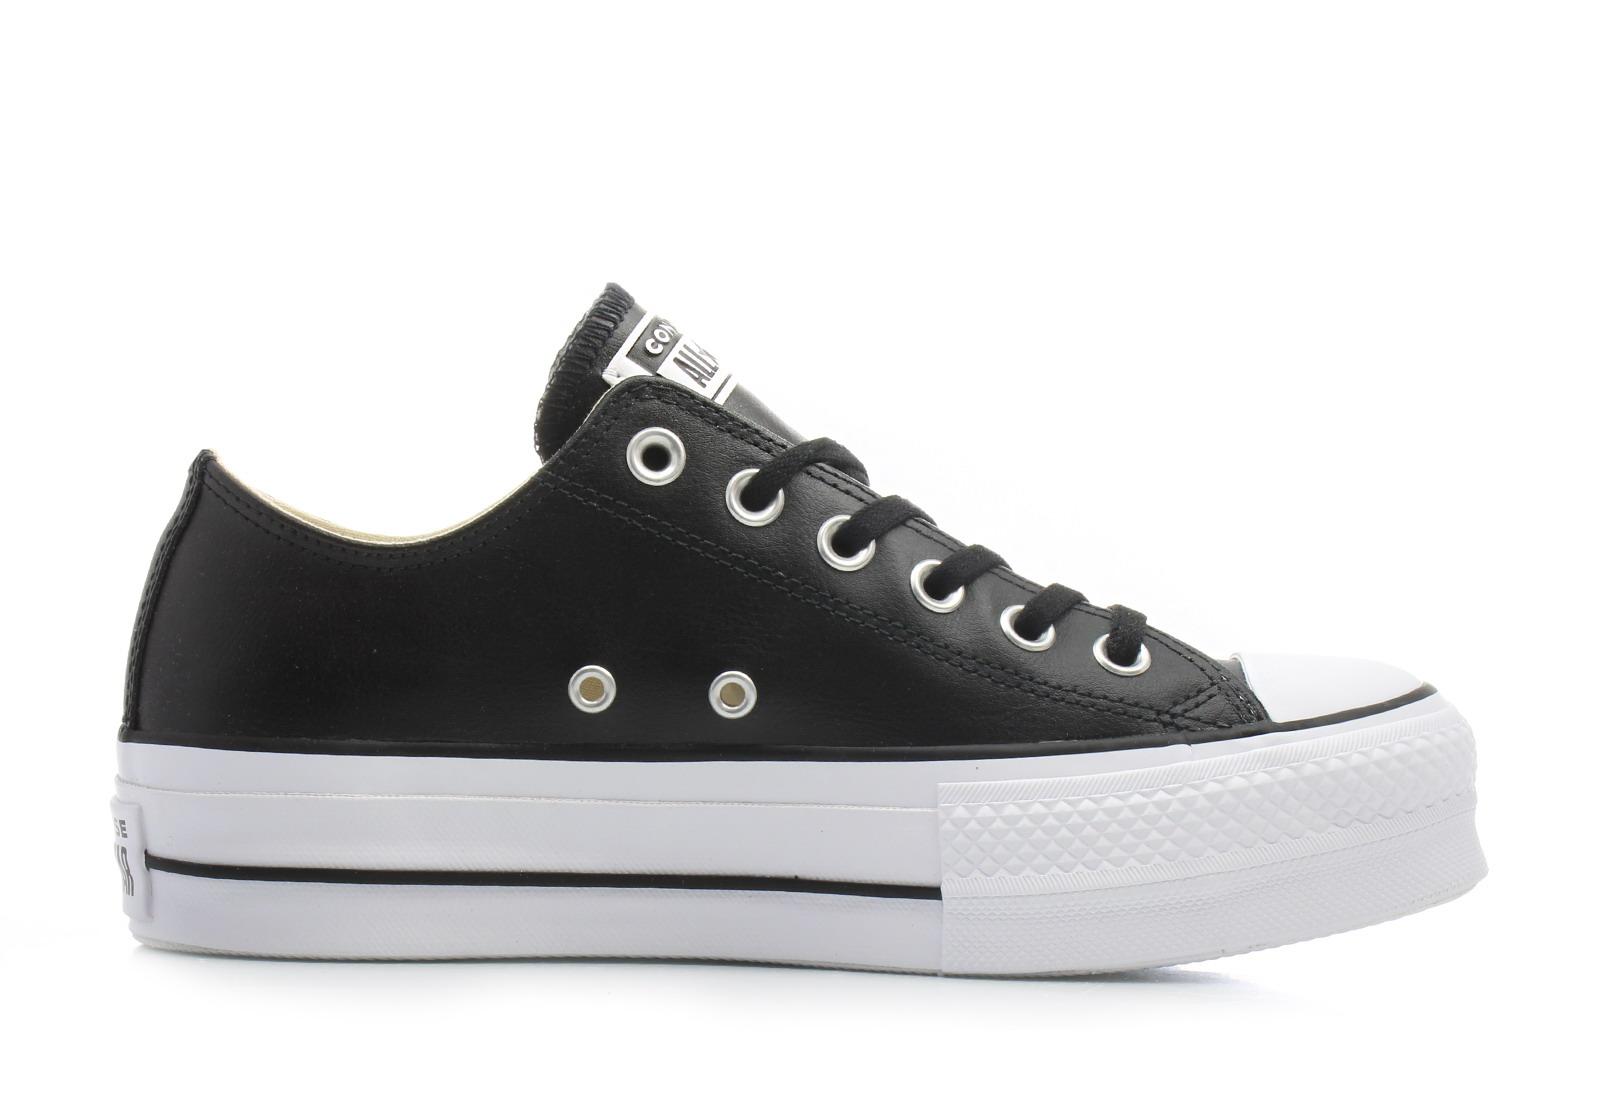 Converse Shoes Ct As Lift Ox 561681c Online Shop For